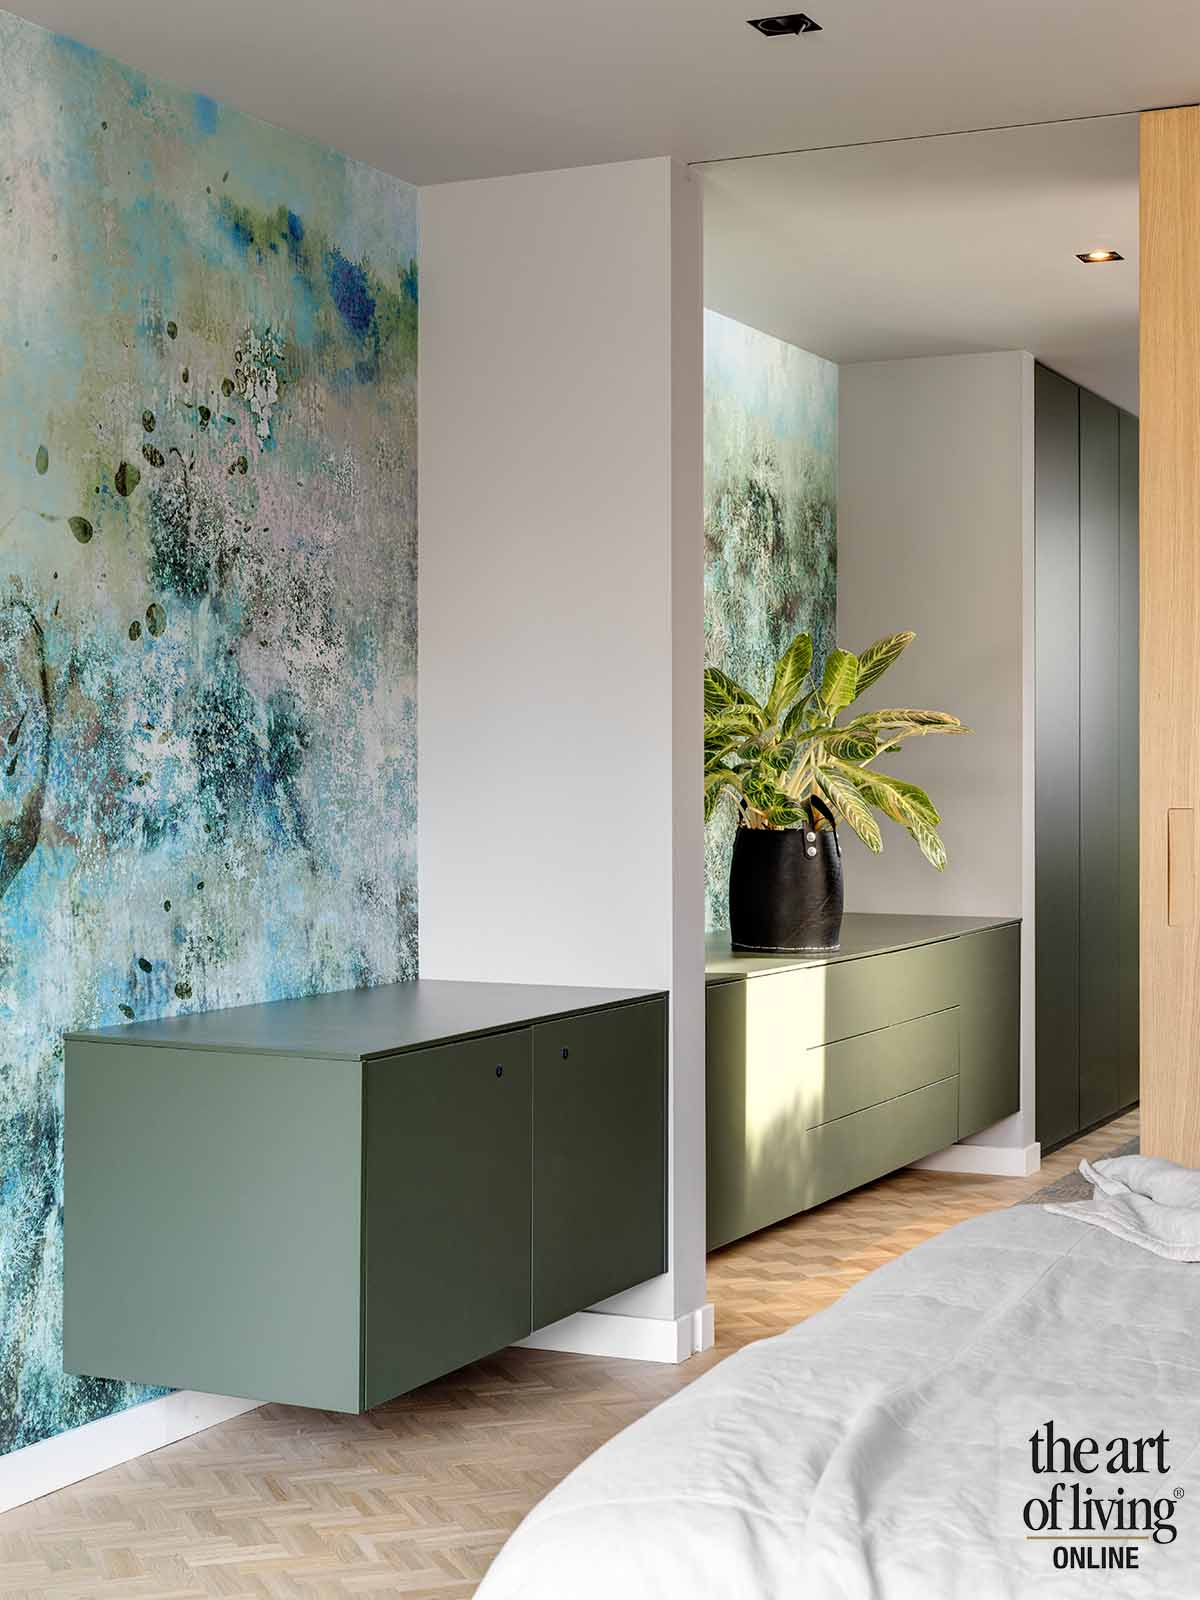 Stijlvol interieur | Springers, the art of living